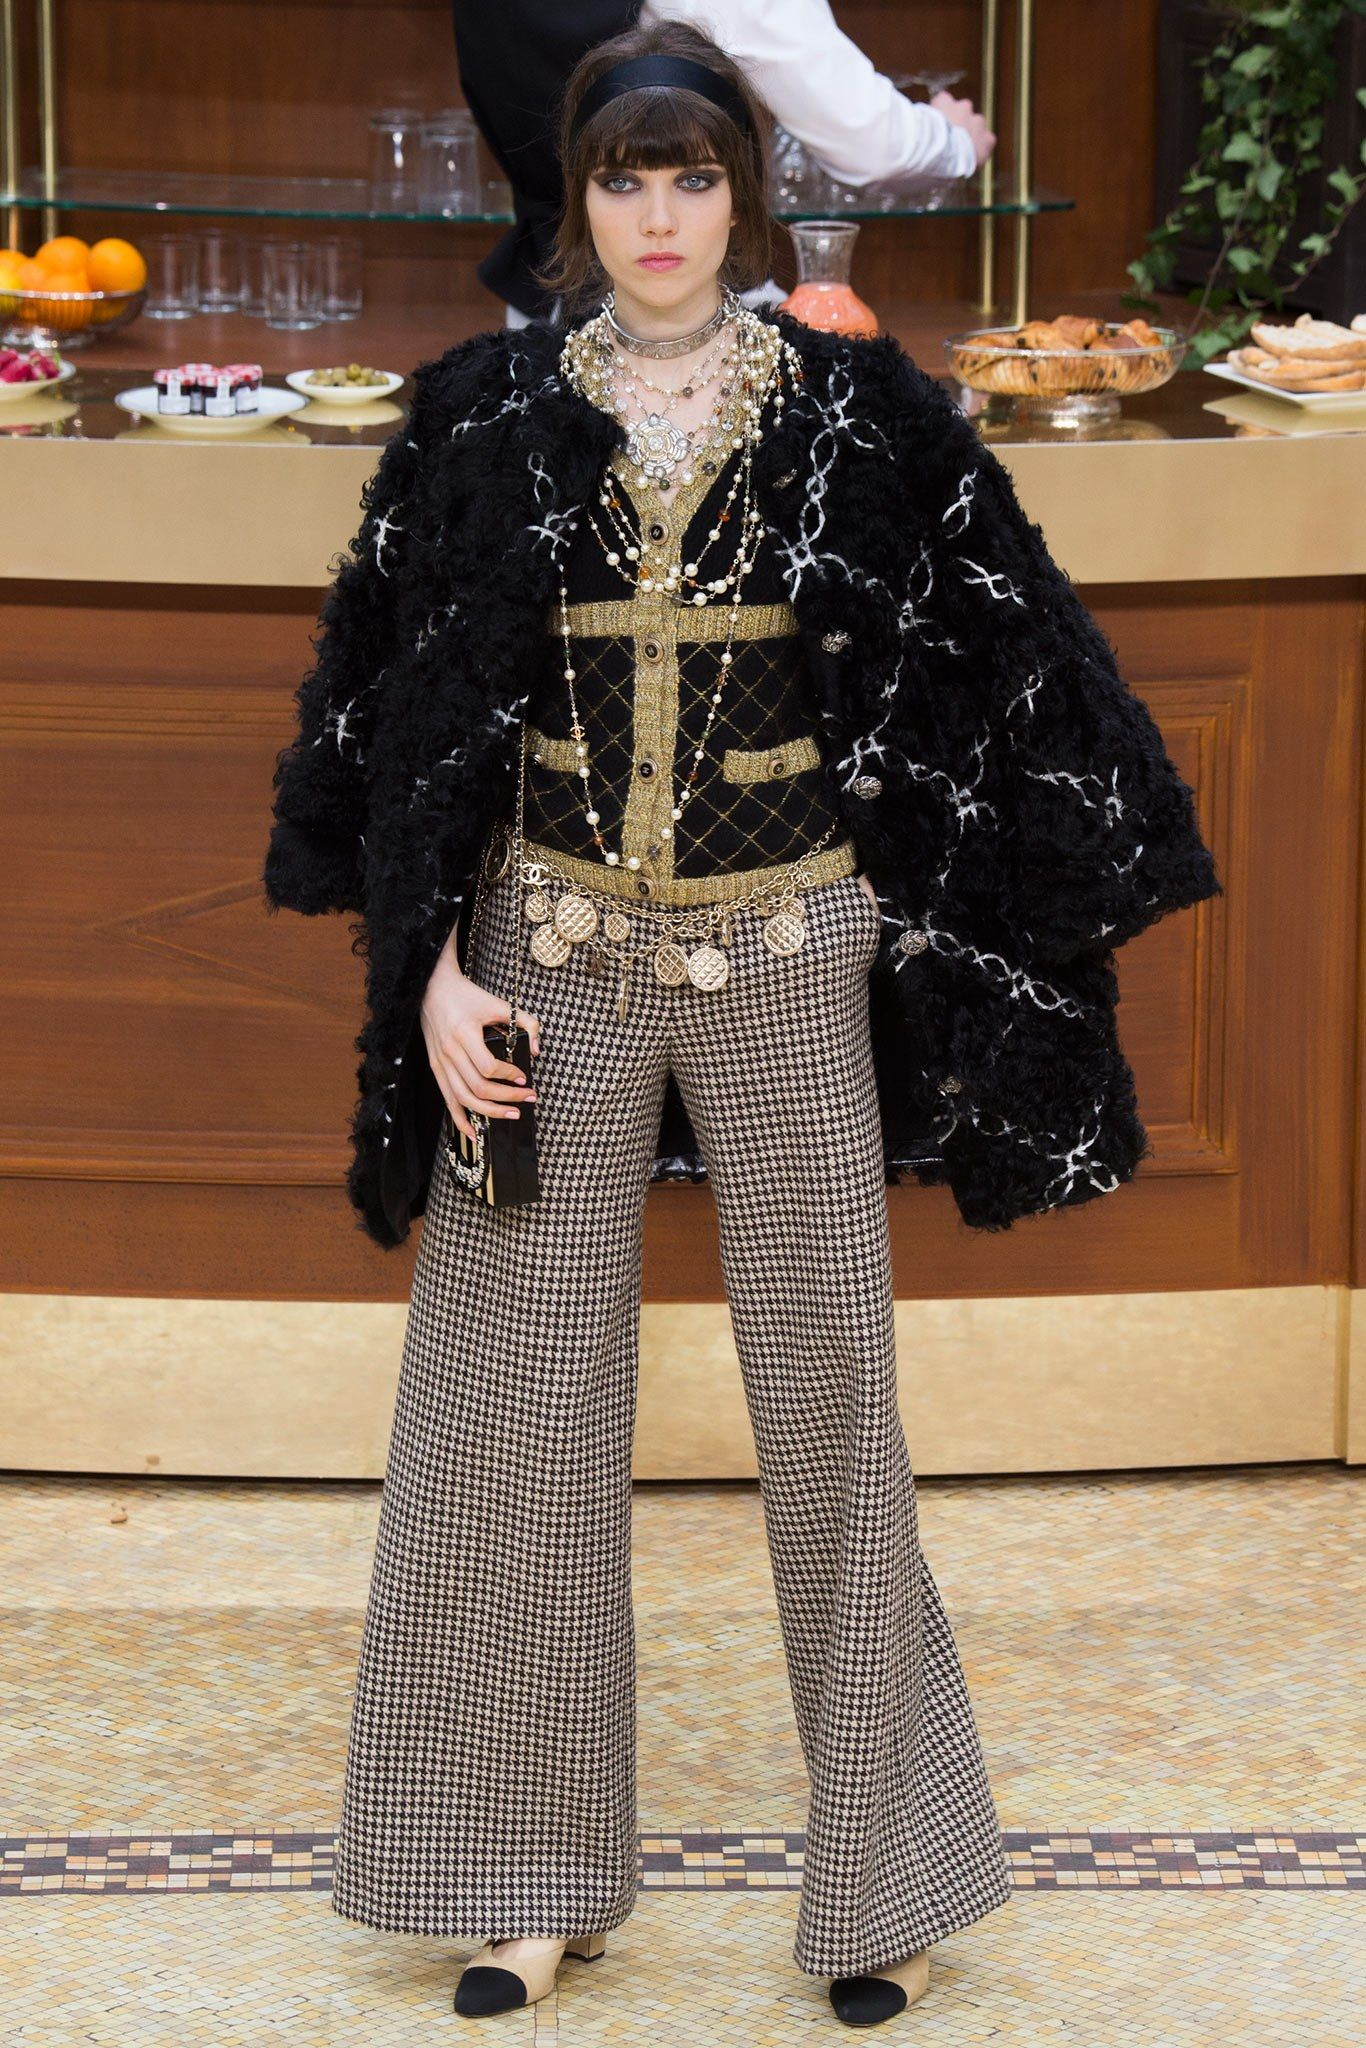 Chanel Fall 2015 Ready-to-Wear Fashion Show - Grace Hartzel (Next)